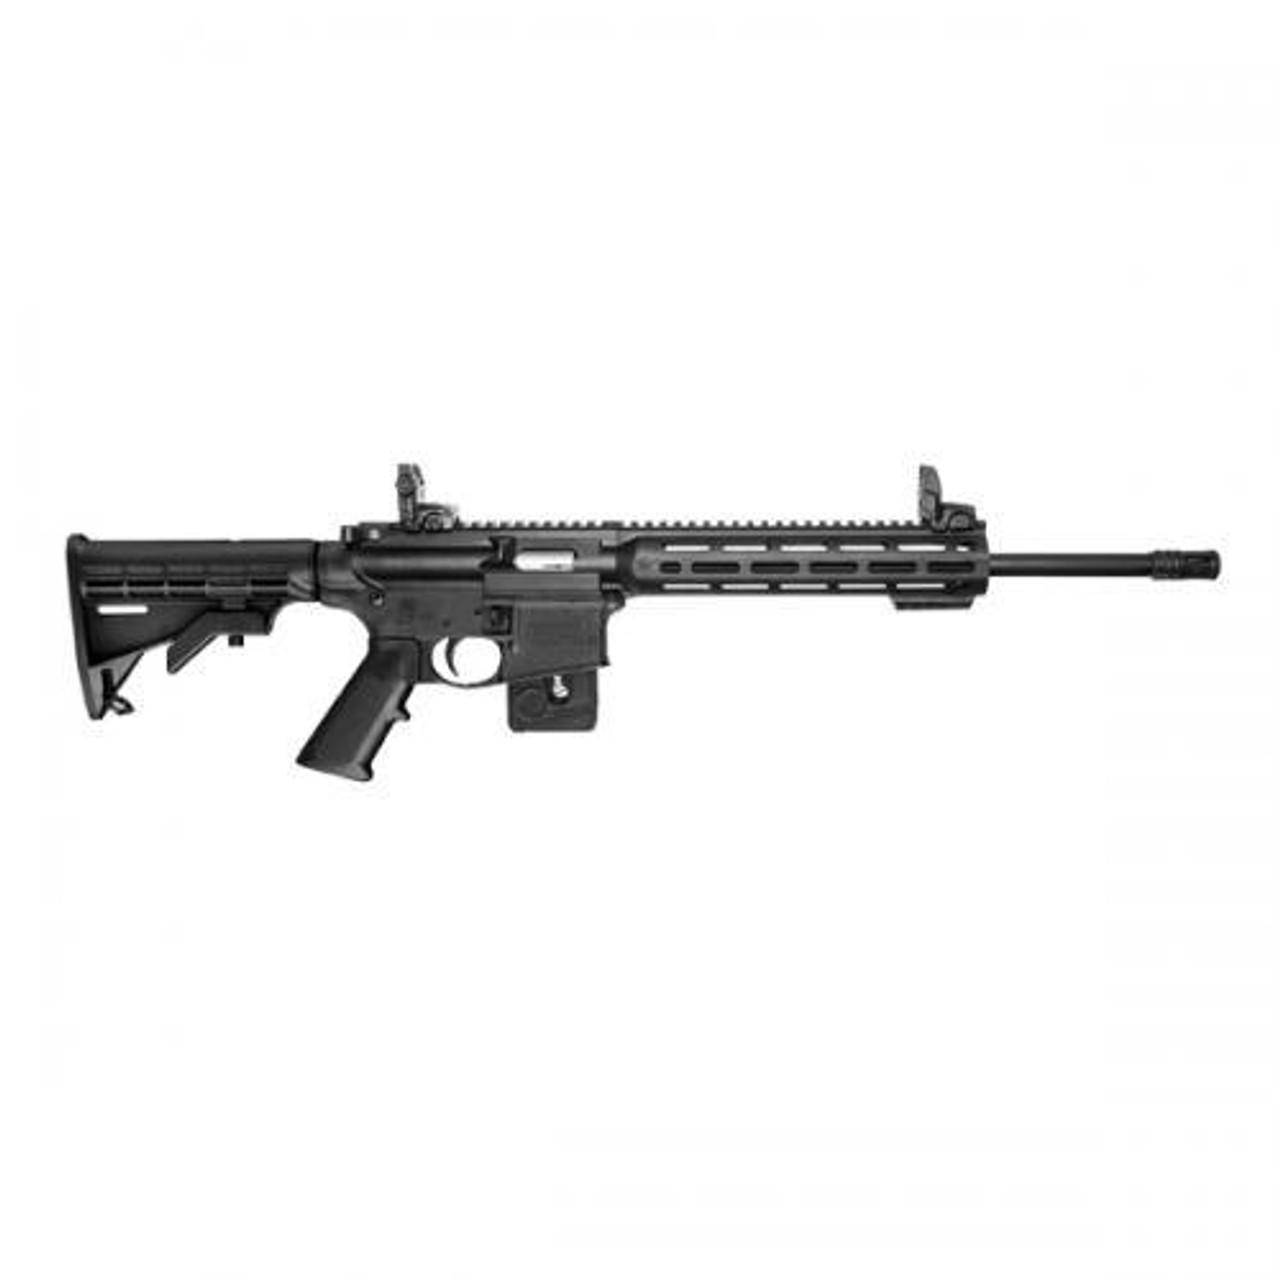 Smith & Wesson M&P®15-22 SPORT™ M-LOK™